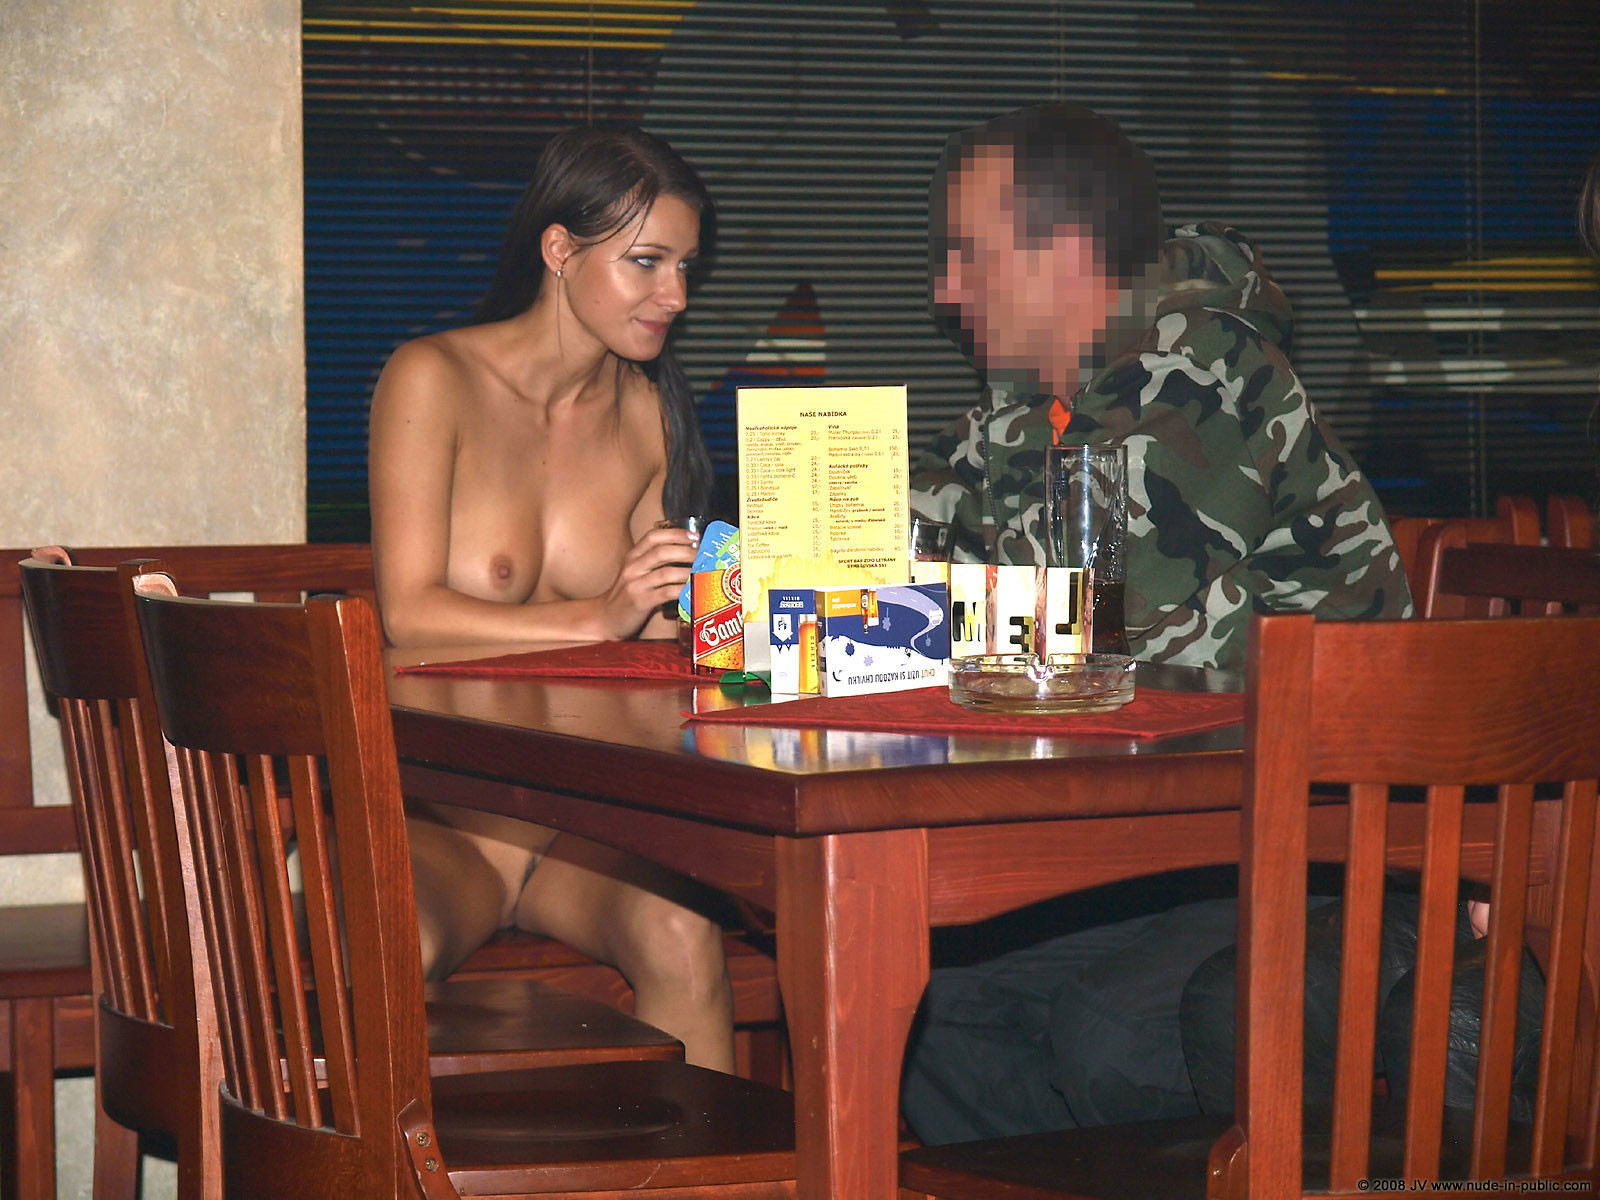 melisa-pub-beer-bar-girl-nude-in-public-79